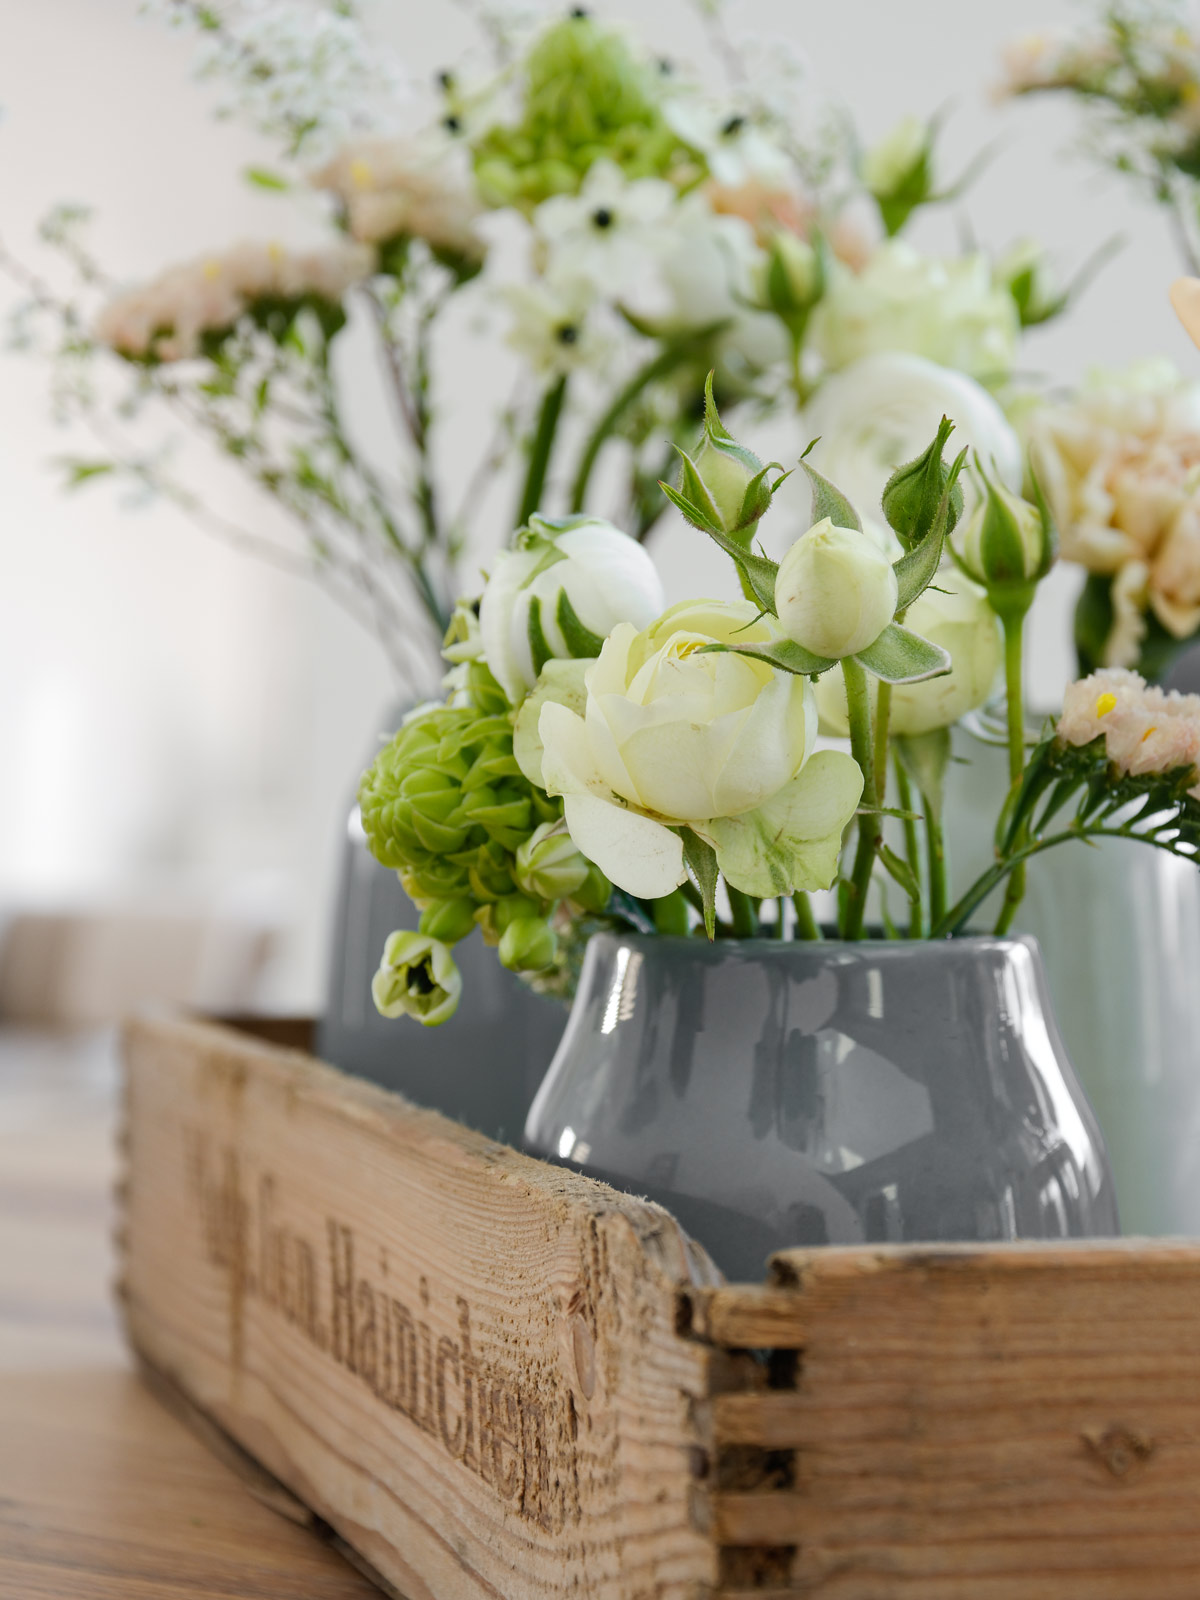 Holundergelee Aus Blüten : dekoration ein meer aus bl ten mxliving ~ Frokenaadalensverden.com Haus und Dekorationen